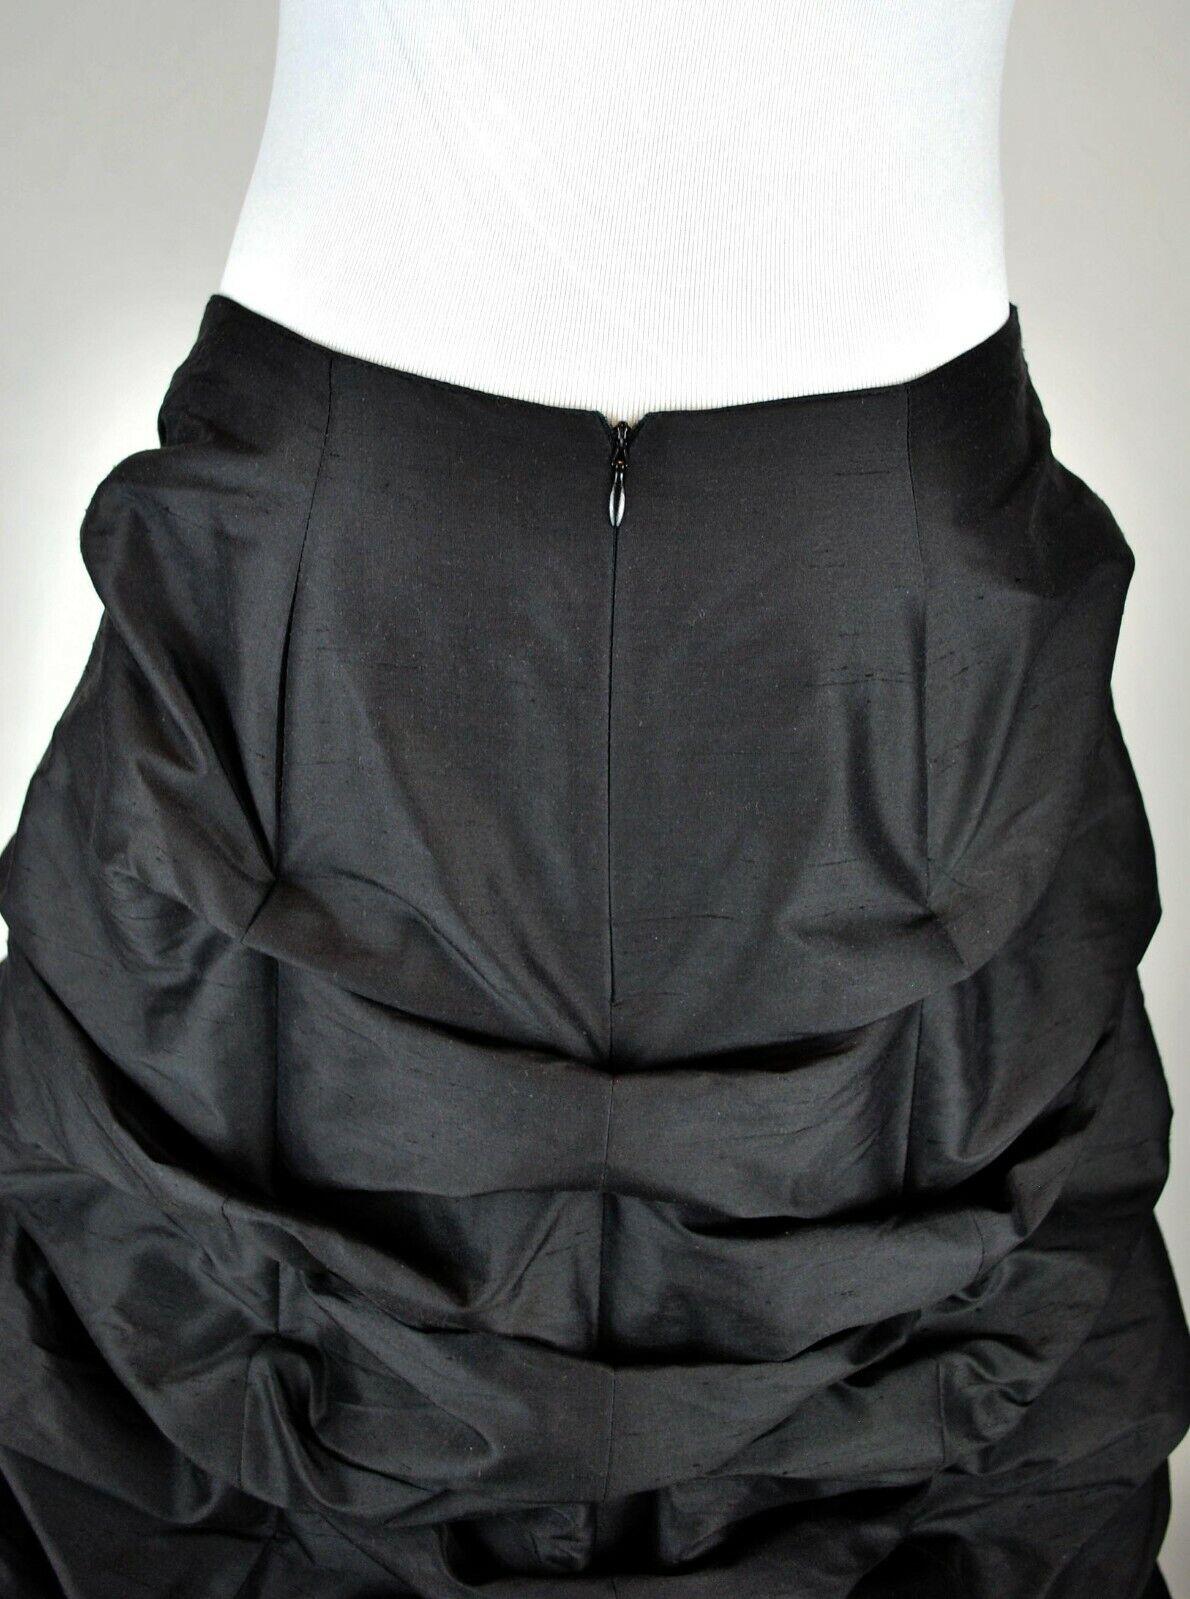 Gothic Balloon Skirt Bustle Gathered Steampunk Vi… - image 7